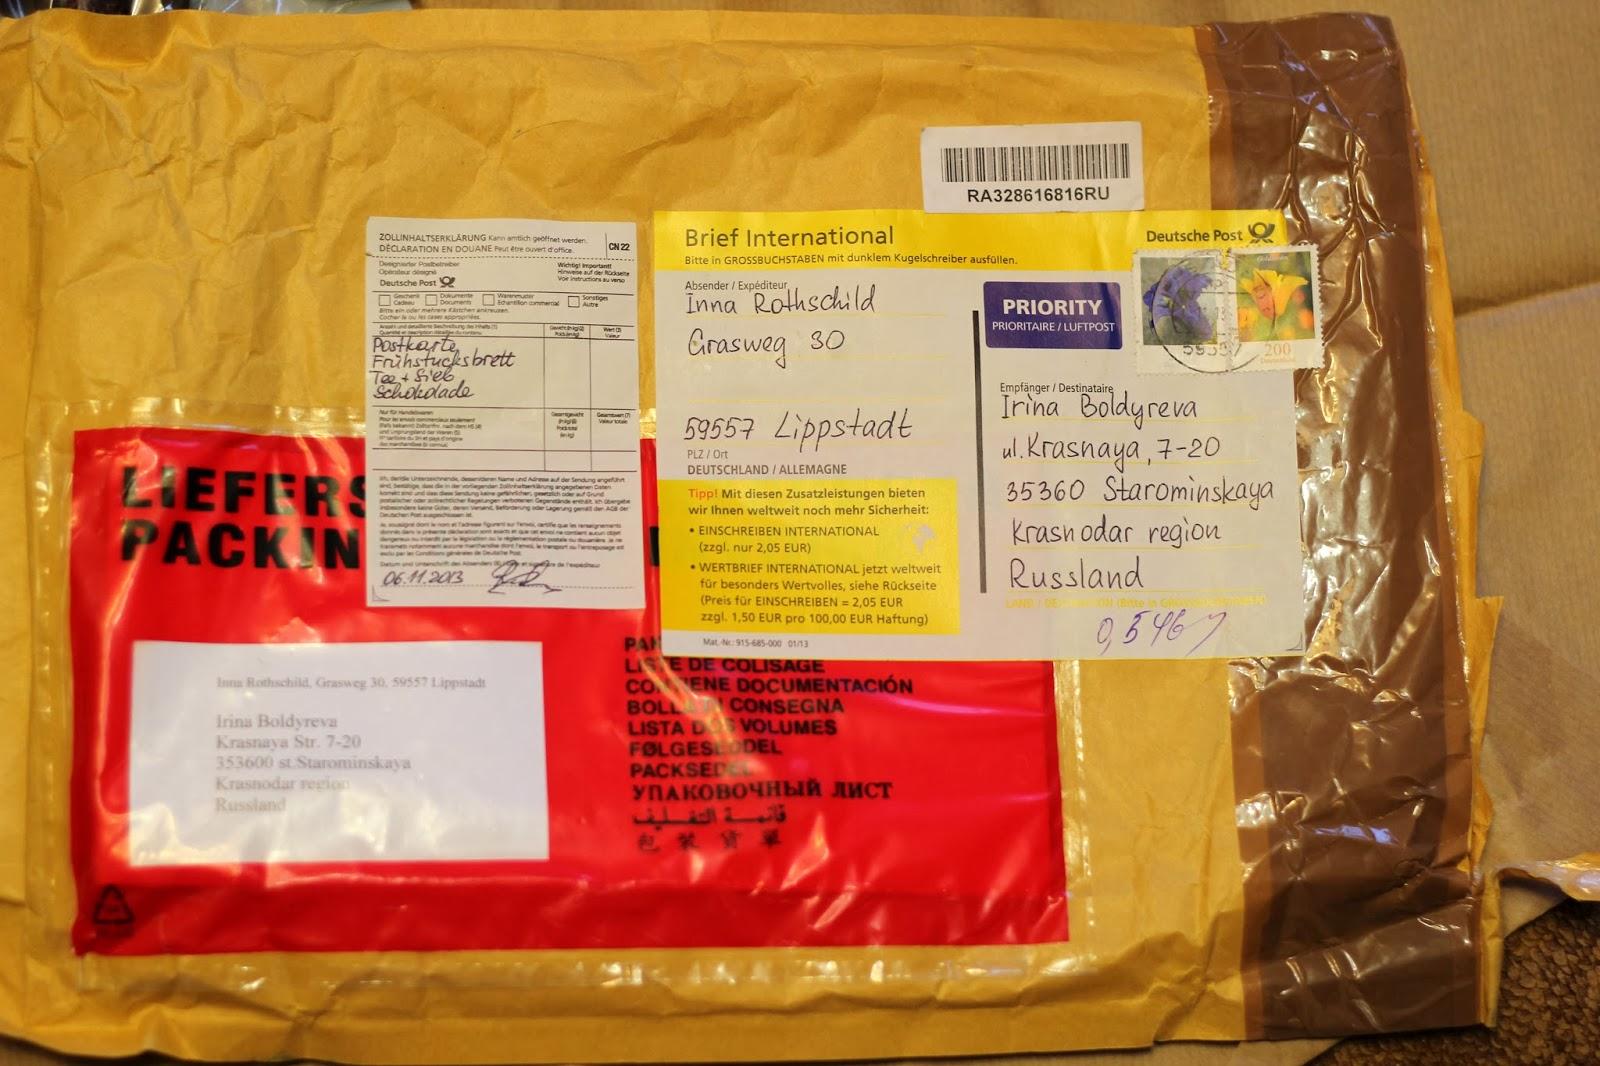 Maxibrief Deutsche Post Dauer Duathlonwacom